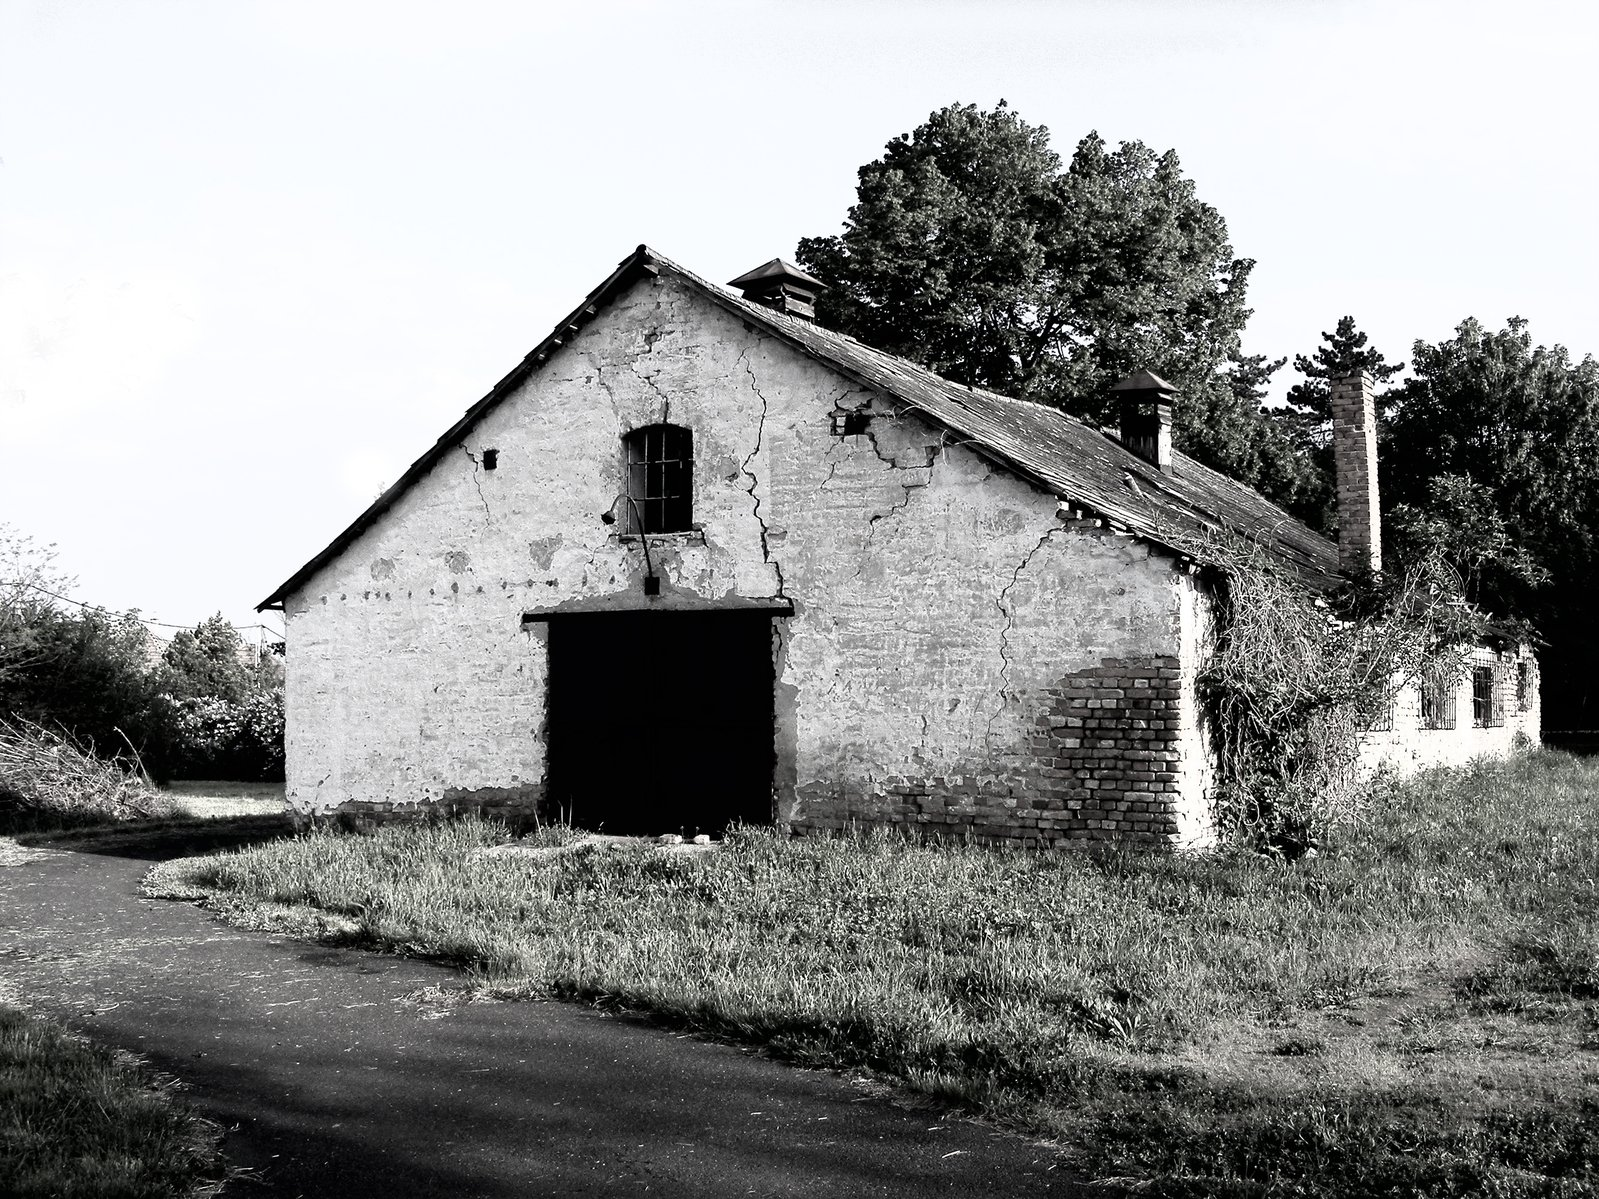 Free Abandoned House Stock Photo - FreeImages com